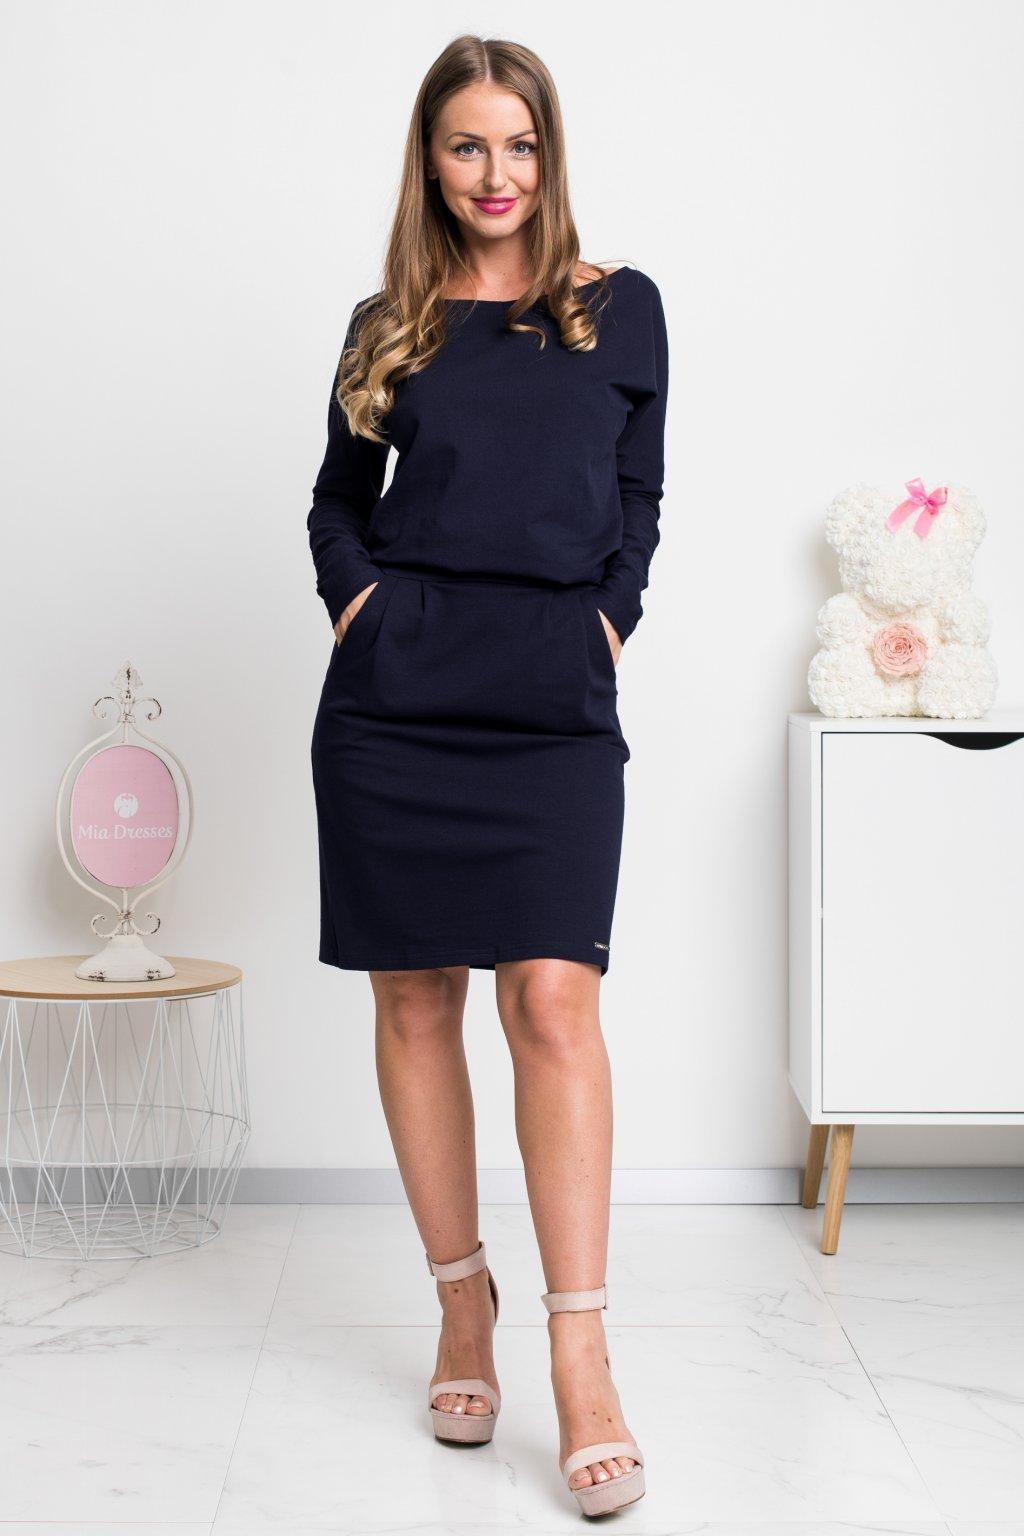 Tmavomodré krátke šaty s rukávmi